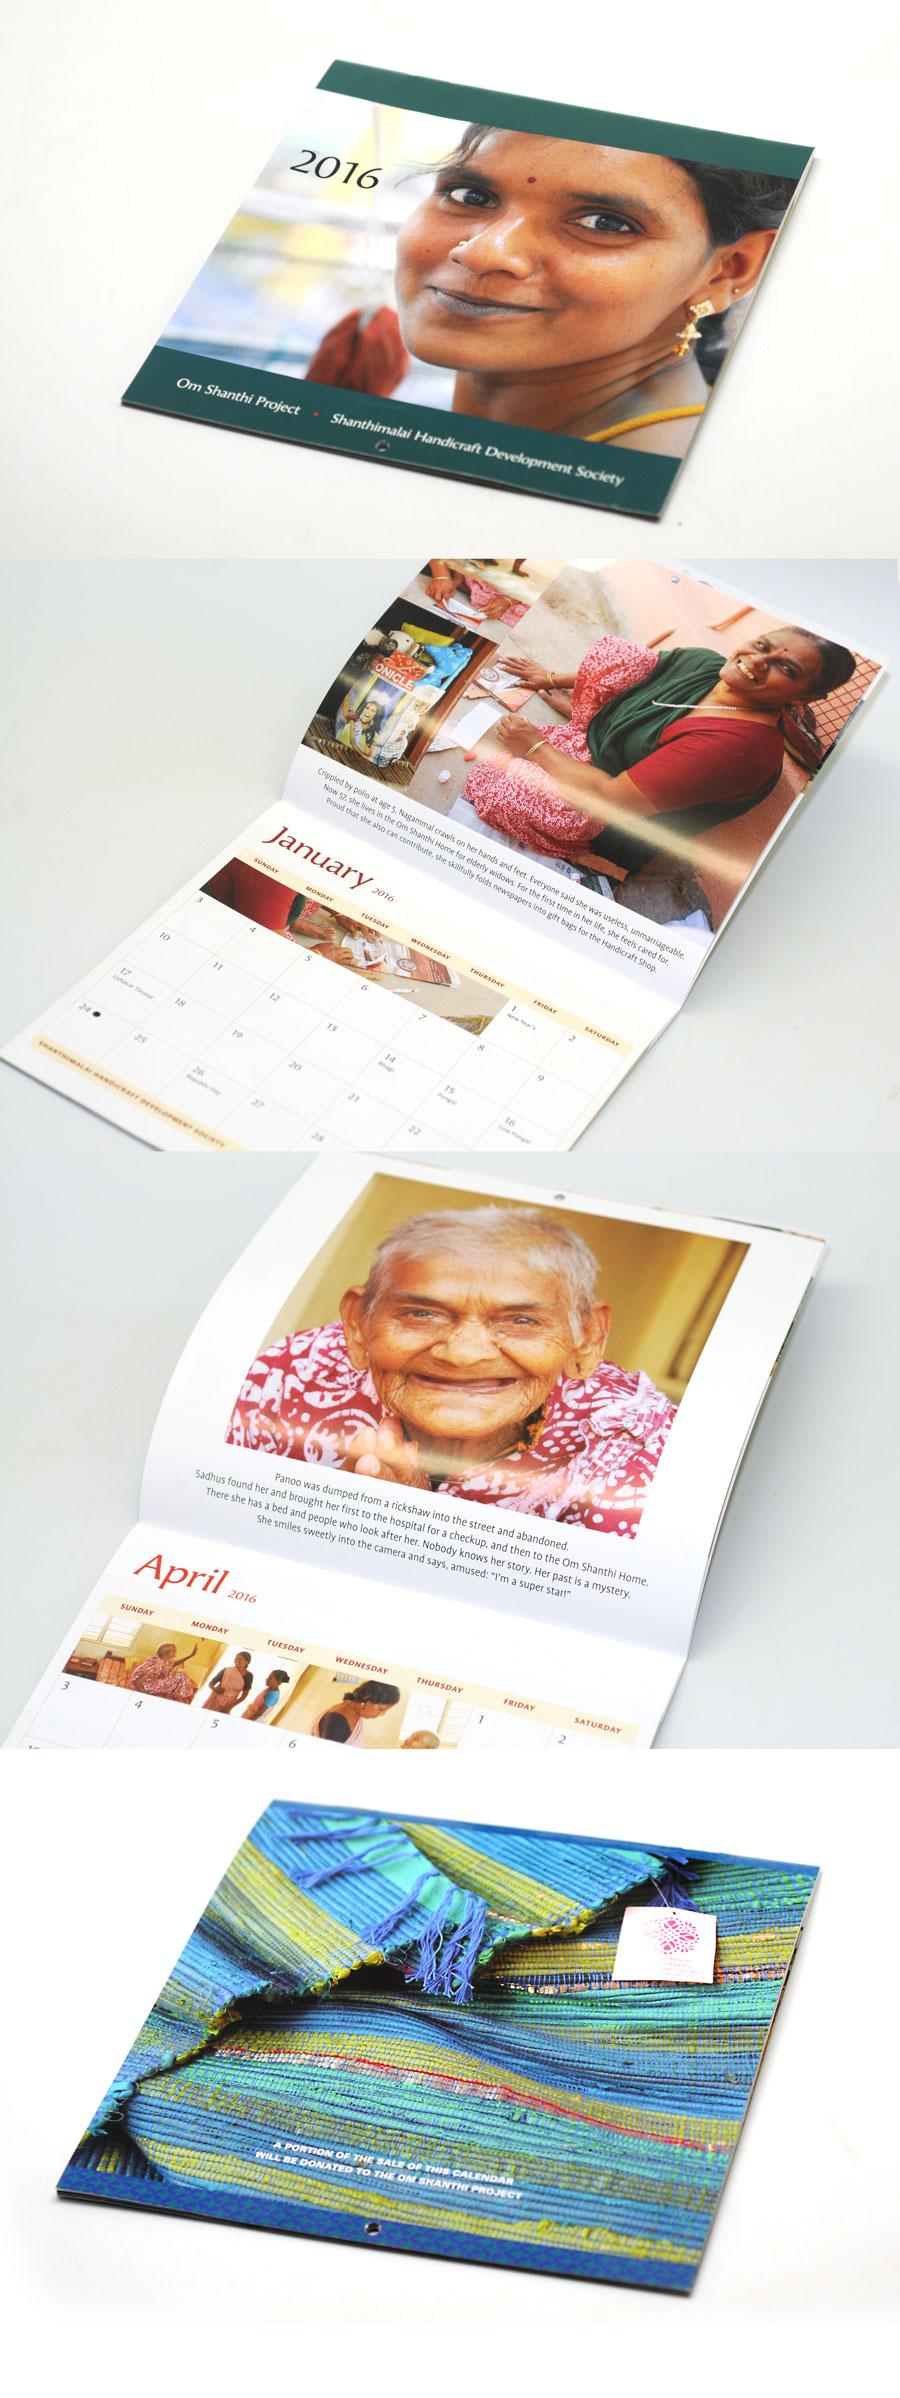 2016 Shantimala calendar